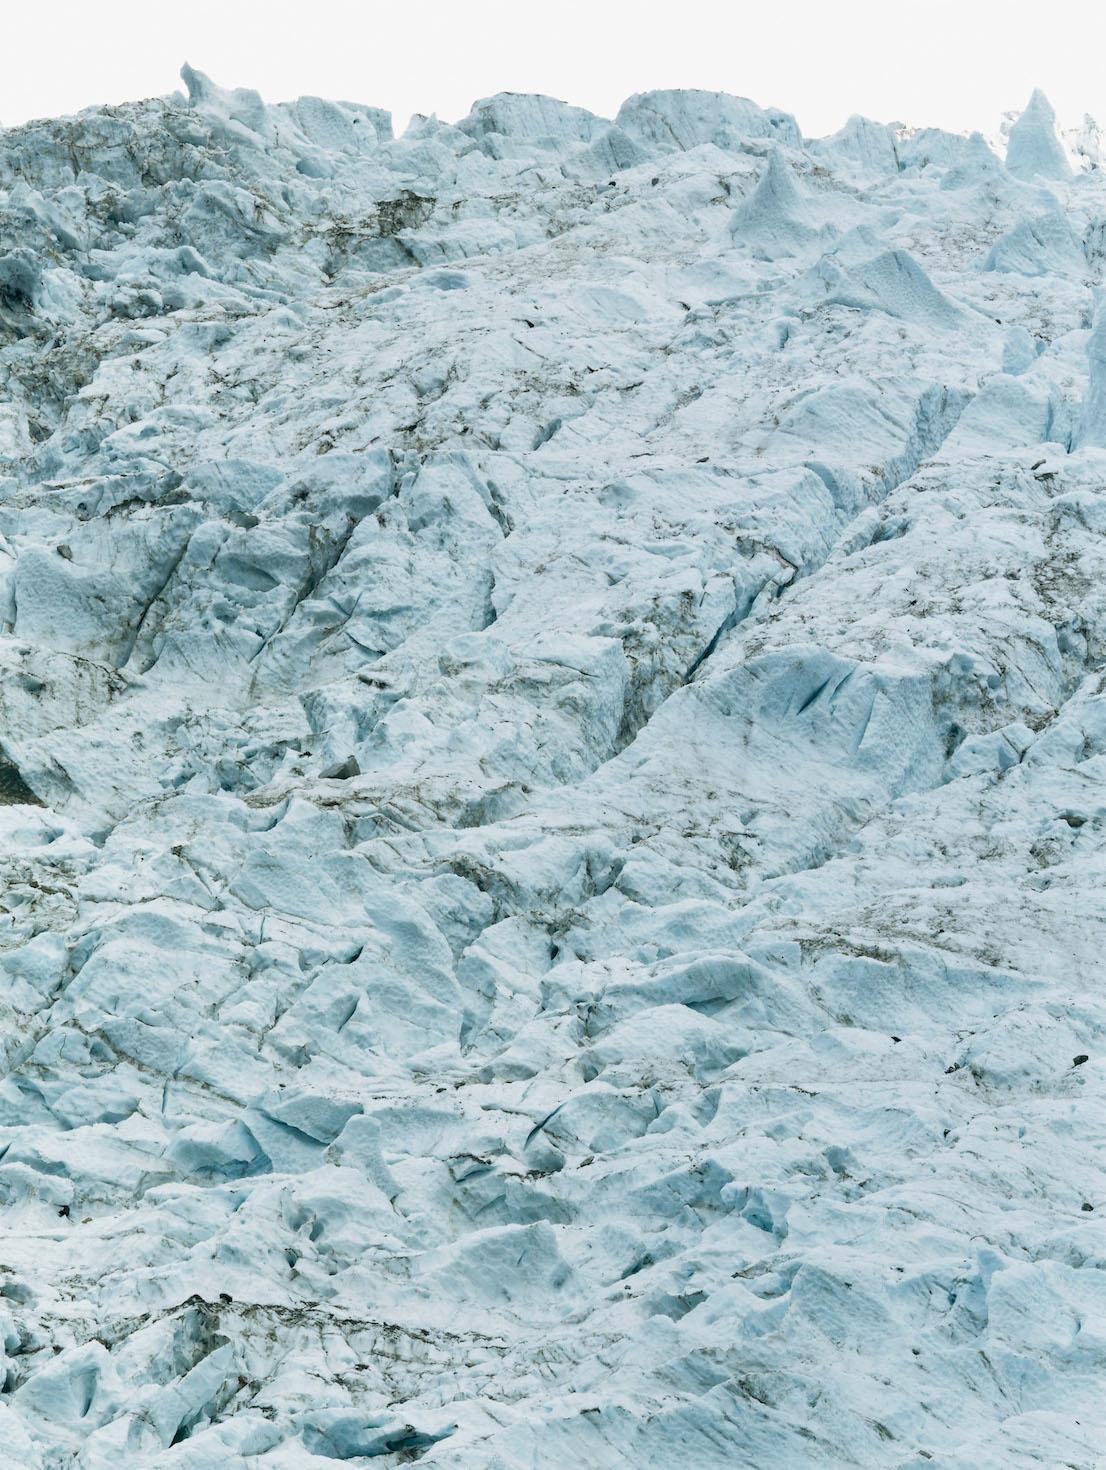 Axel Hütte Glaciers des Bossons, Francia dalla serie Glaciers, 1997.